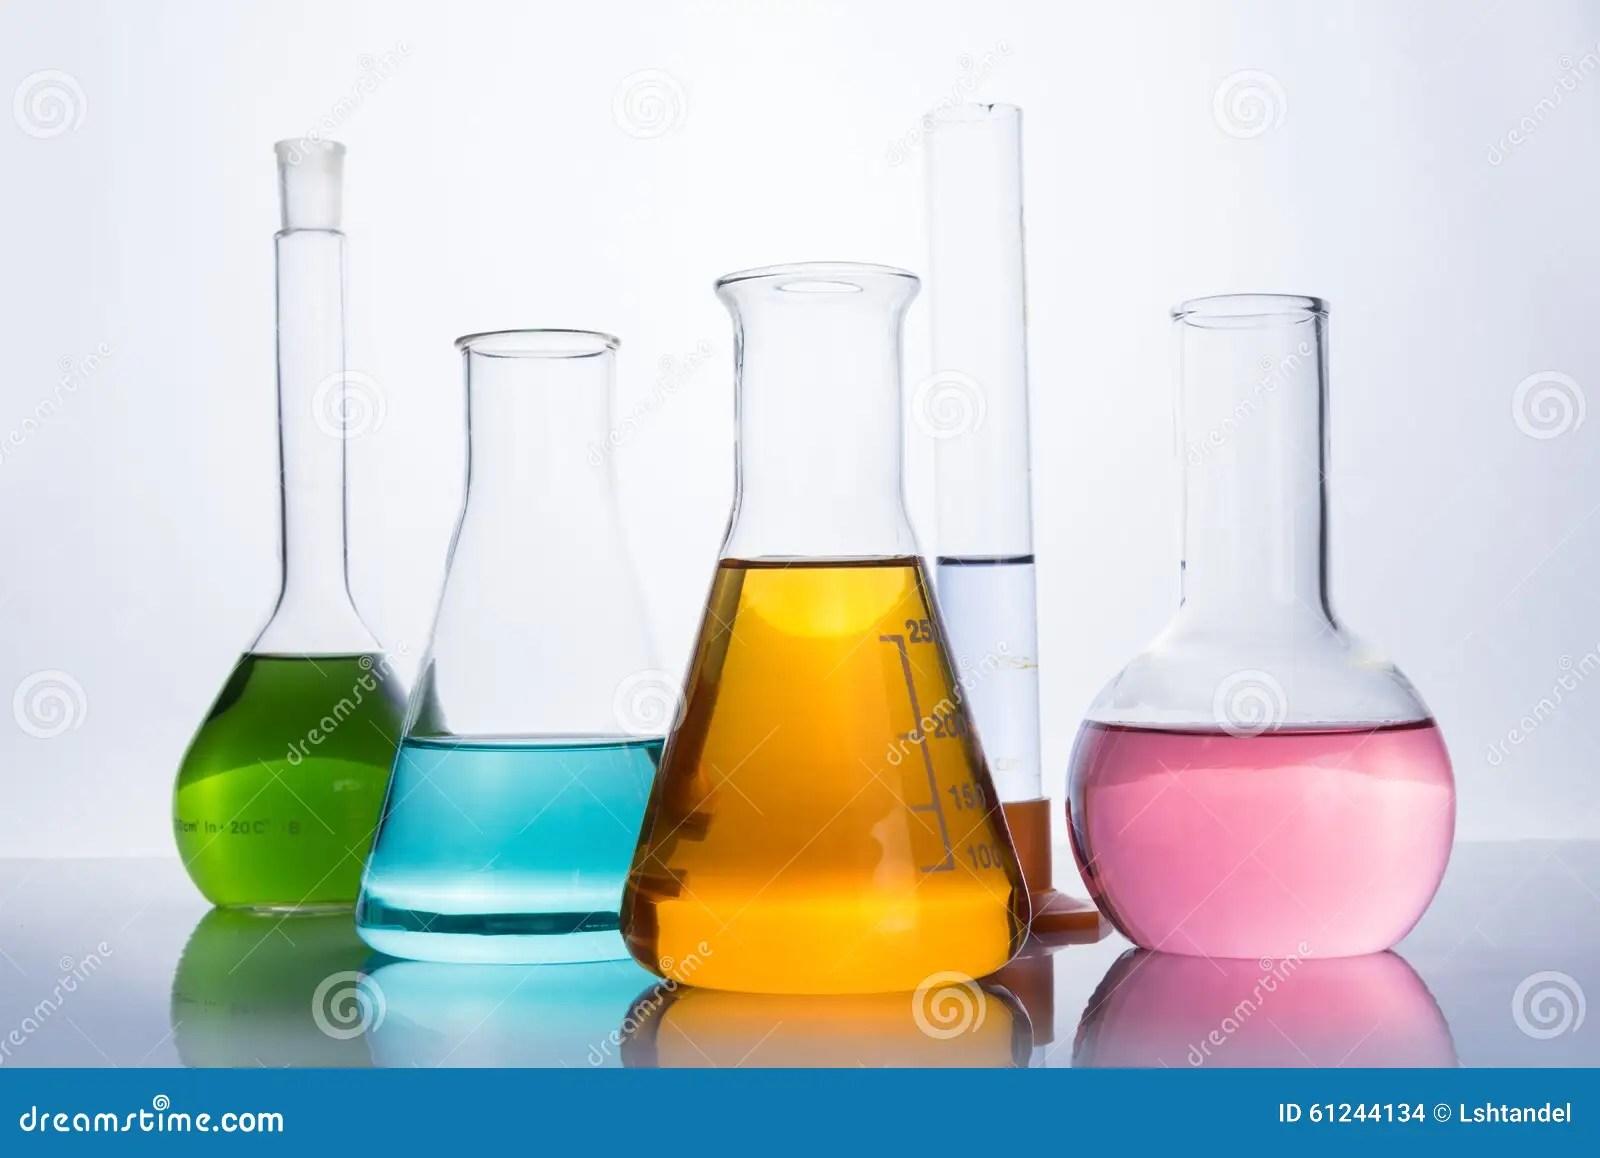 Chemistry Laboratory Equipment Flasks And Test Tube Stock Photo